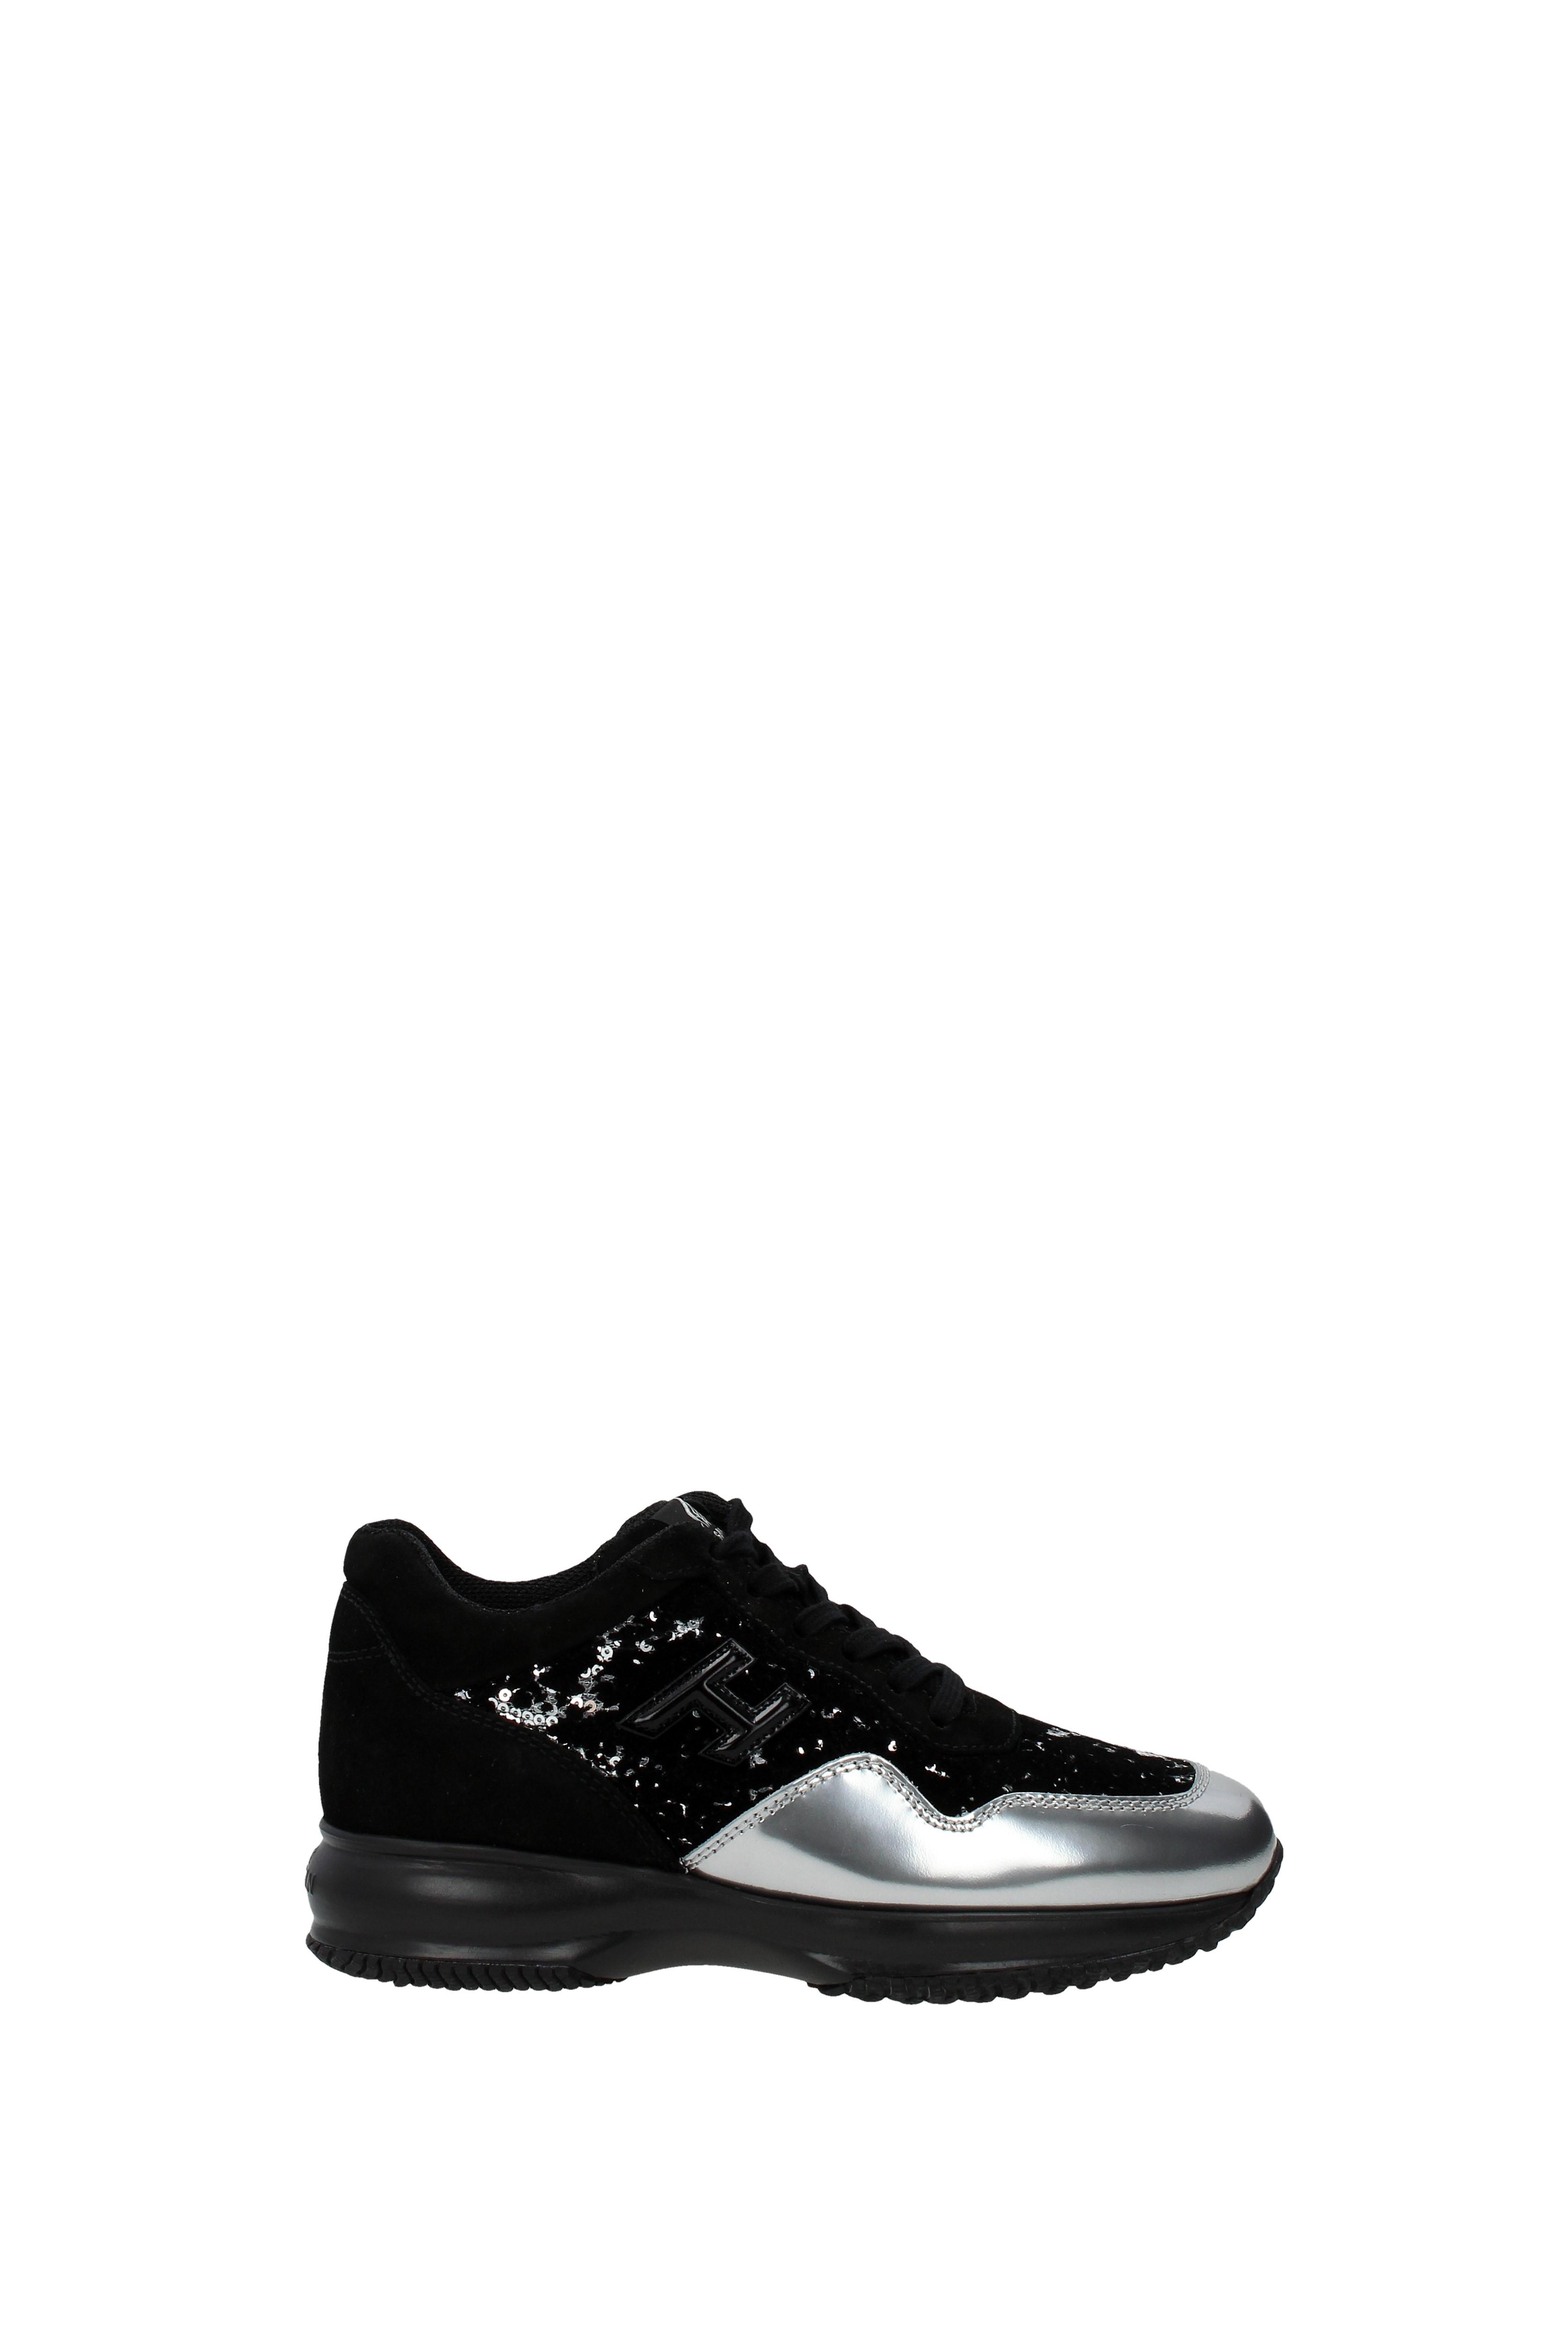 free shipping 8ab0c 82acb Alta qualit Sneakers Hogan Donna Vernice HXW00N0W660HII vendita